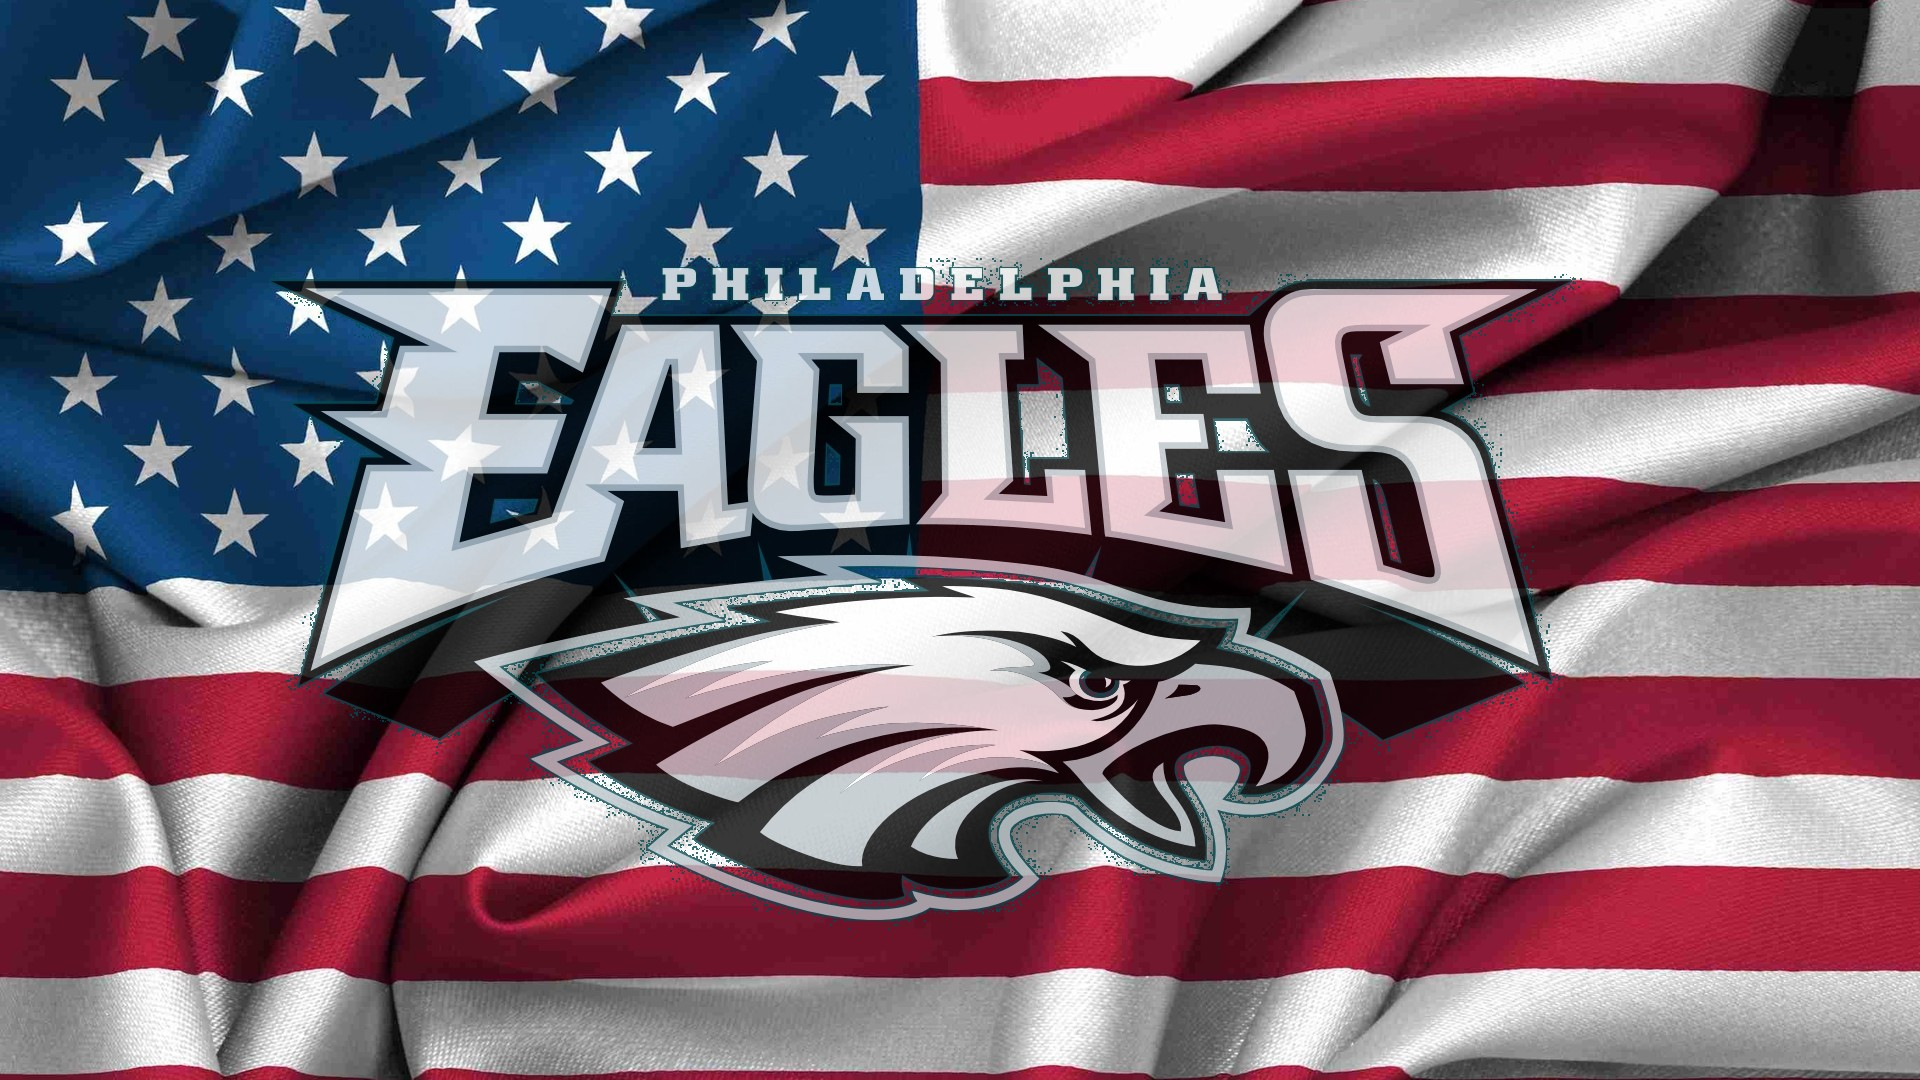 [46+] Philadelphia Eagles HD Wallpaper on WallpaperSafari